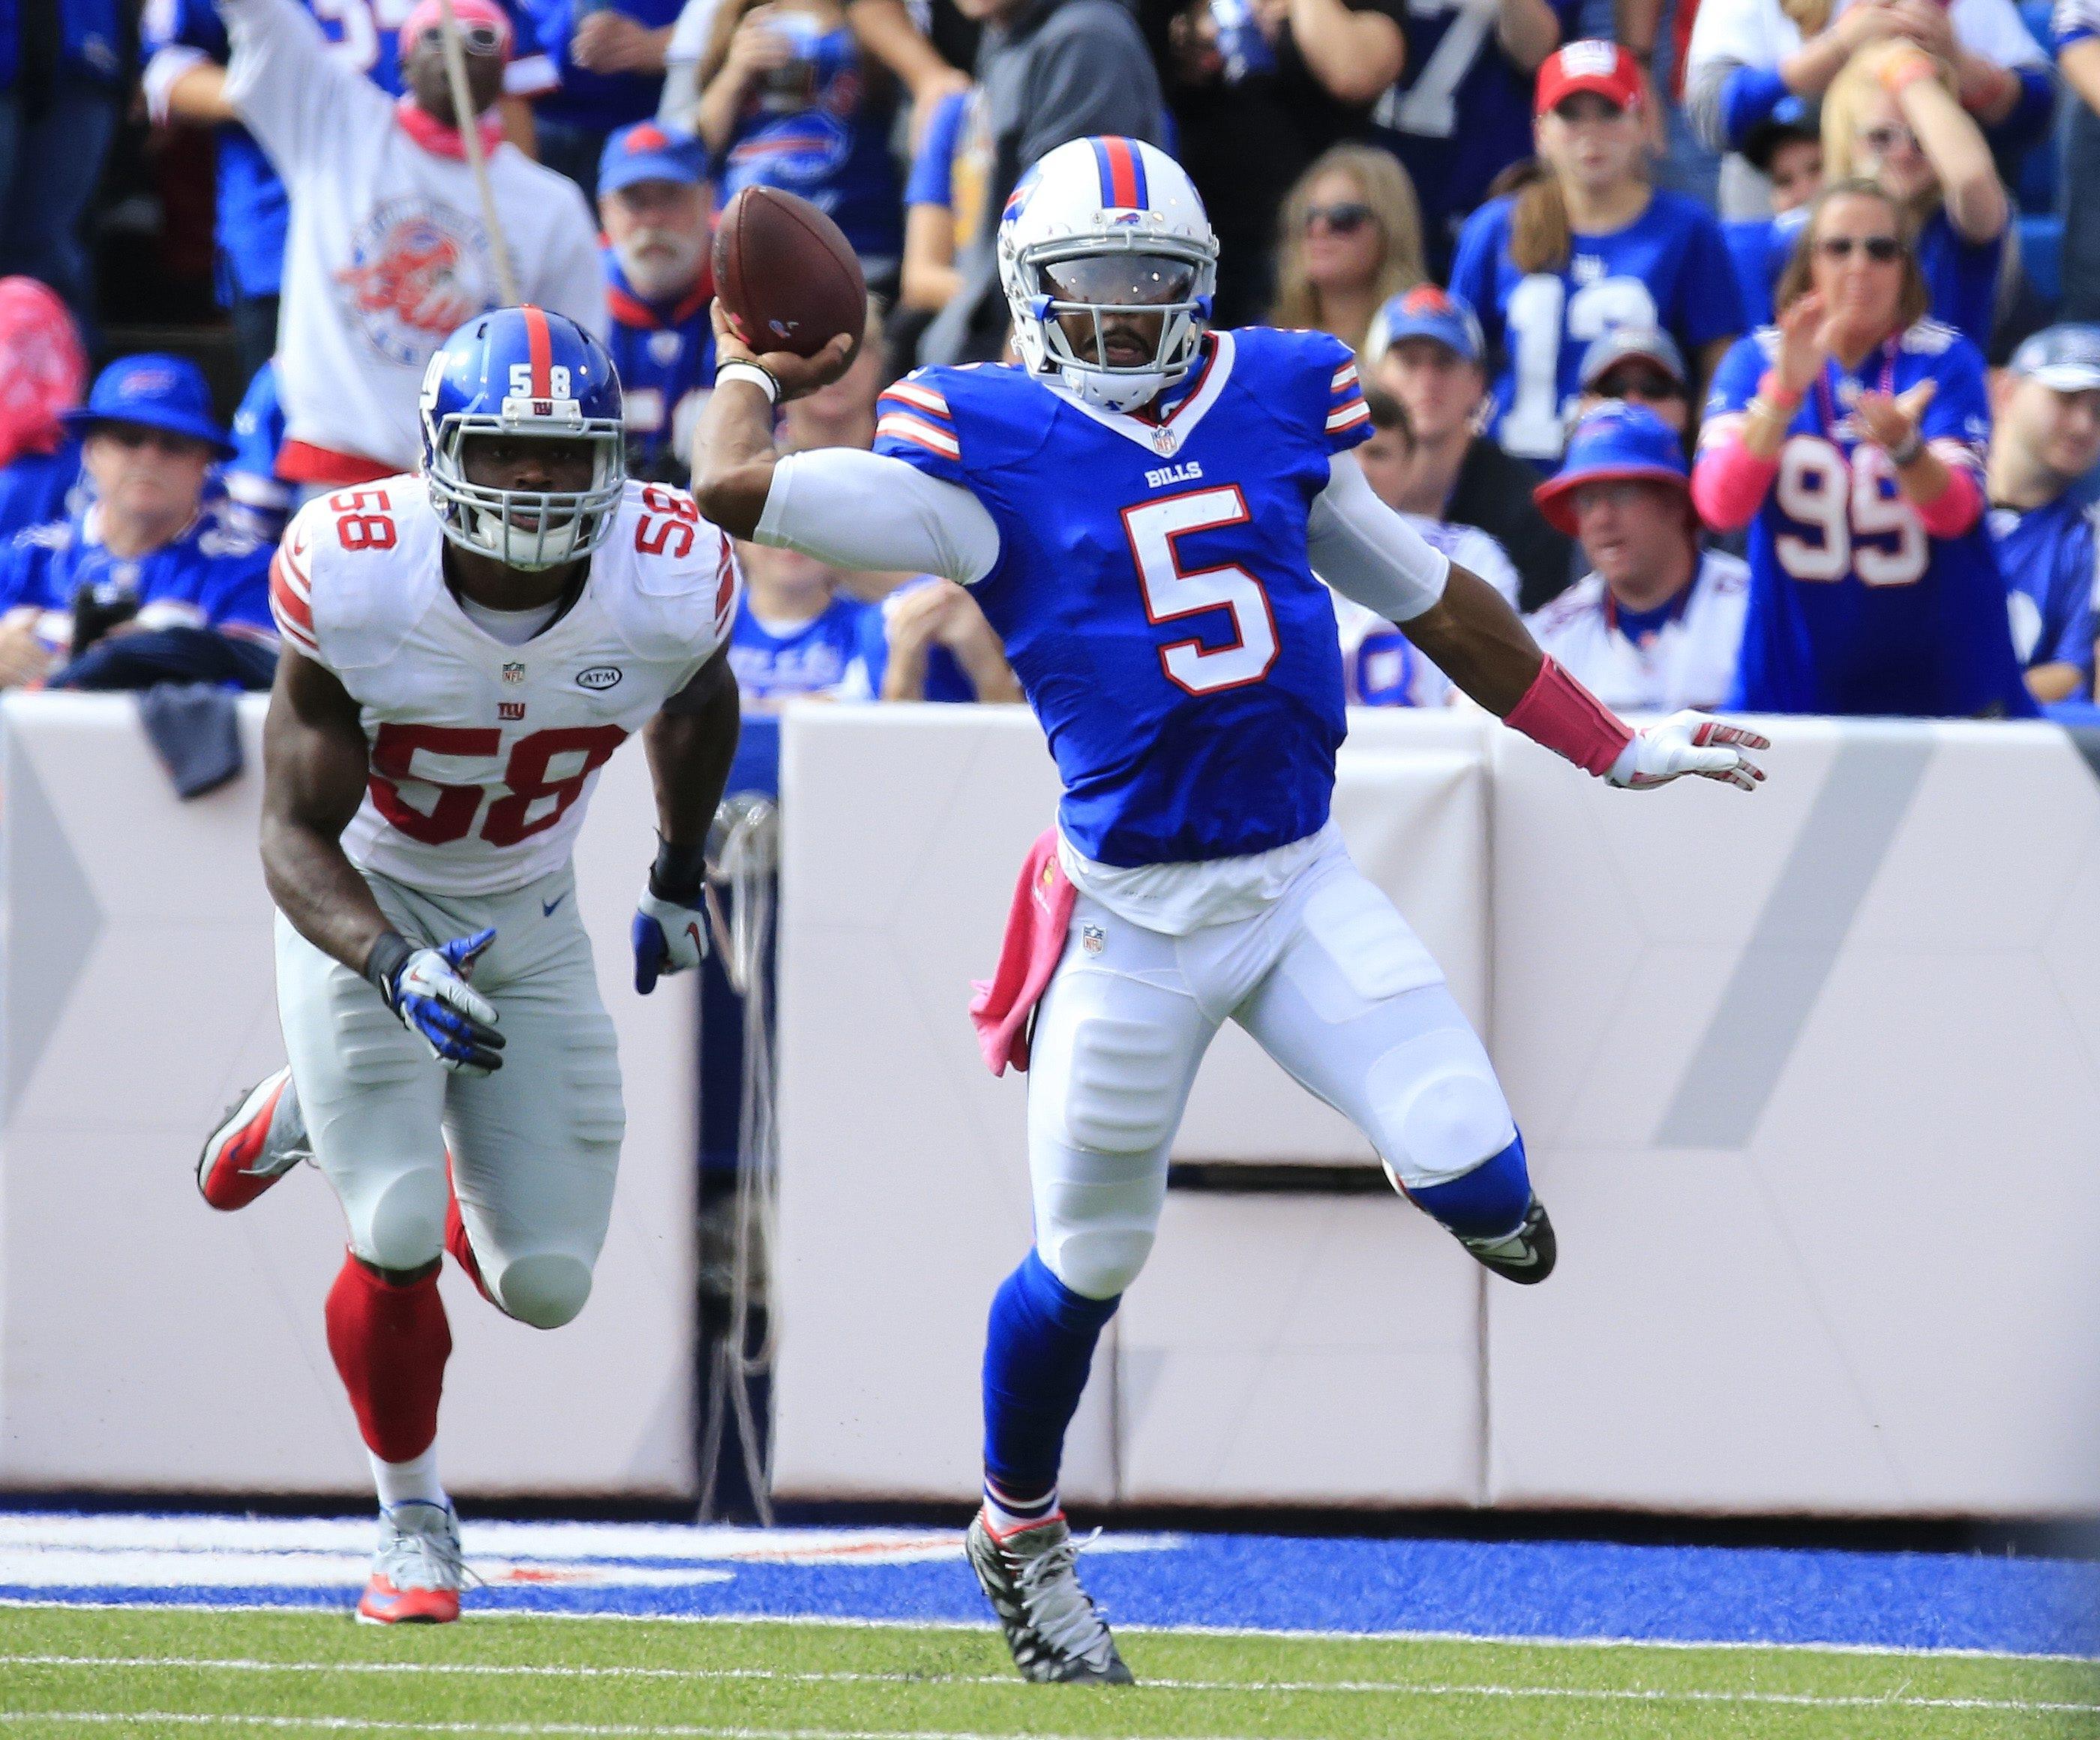 Buffalo Bills  Tyrod Taylor throws against the New York Giants  during third quarter action at Ralph Wilson Stadium on Sunday, Oct. 4, 2015.  (Harry Scull Jr./Buffalo News)